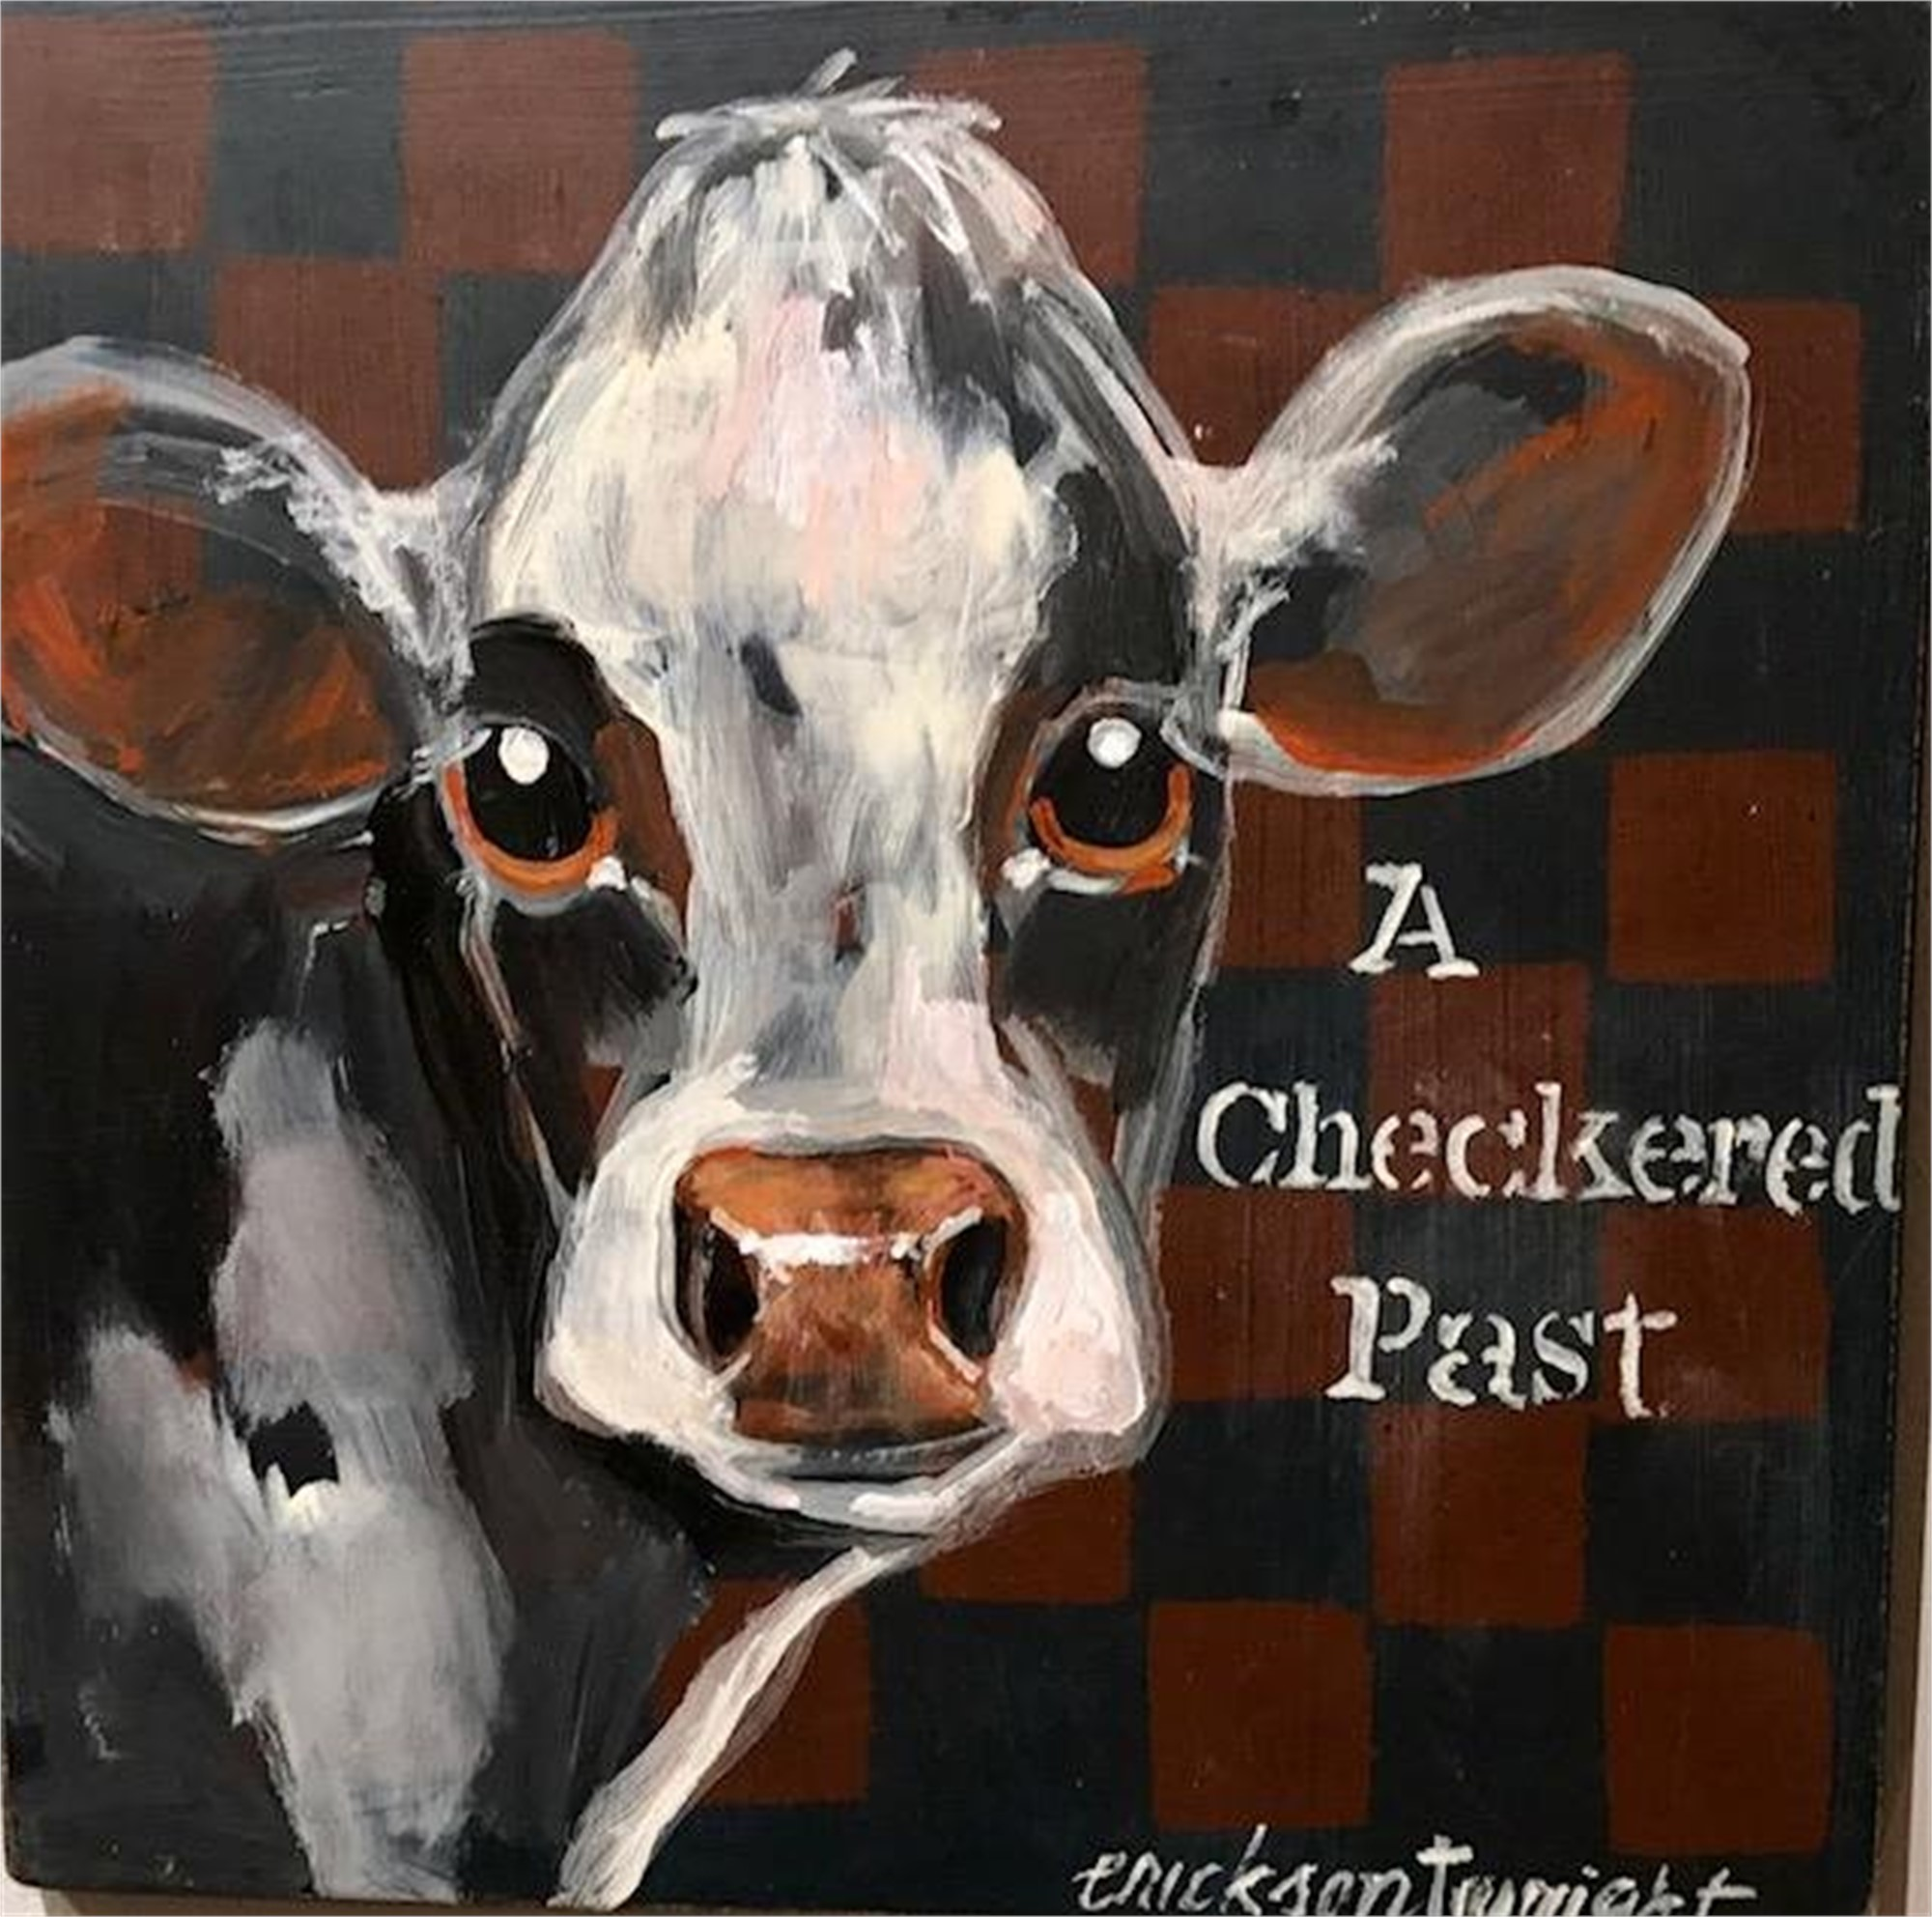 Checkered Past by Sandra Erickson Wright